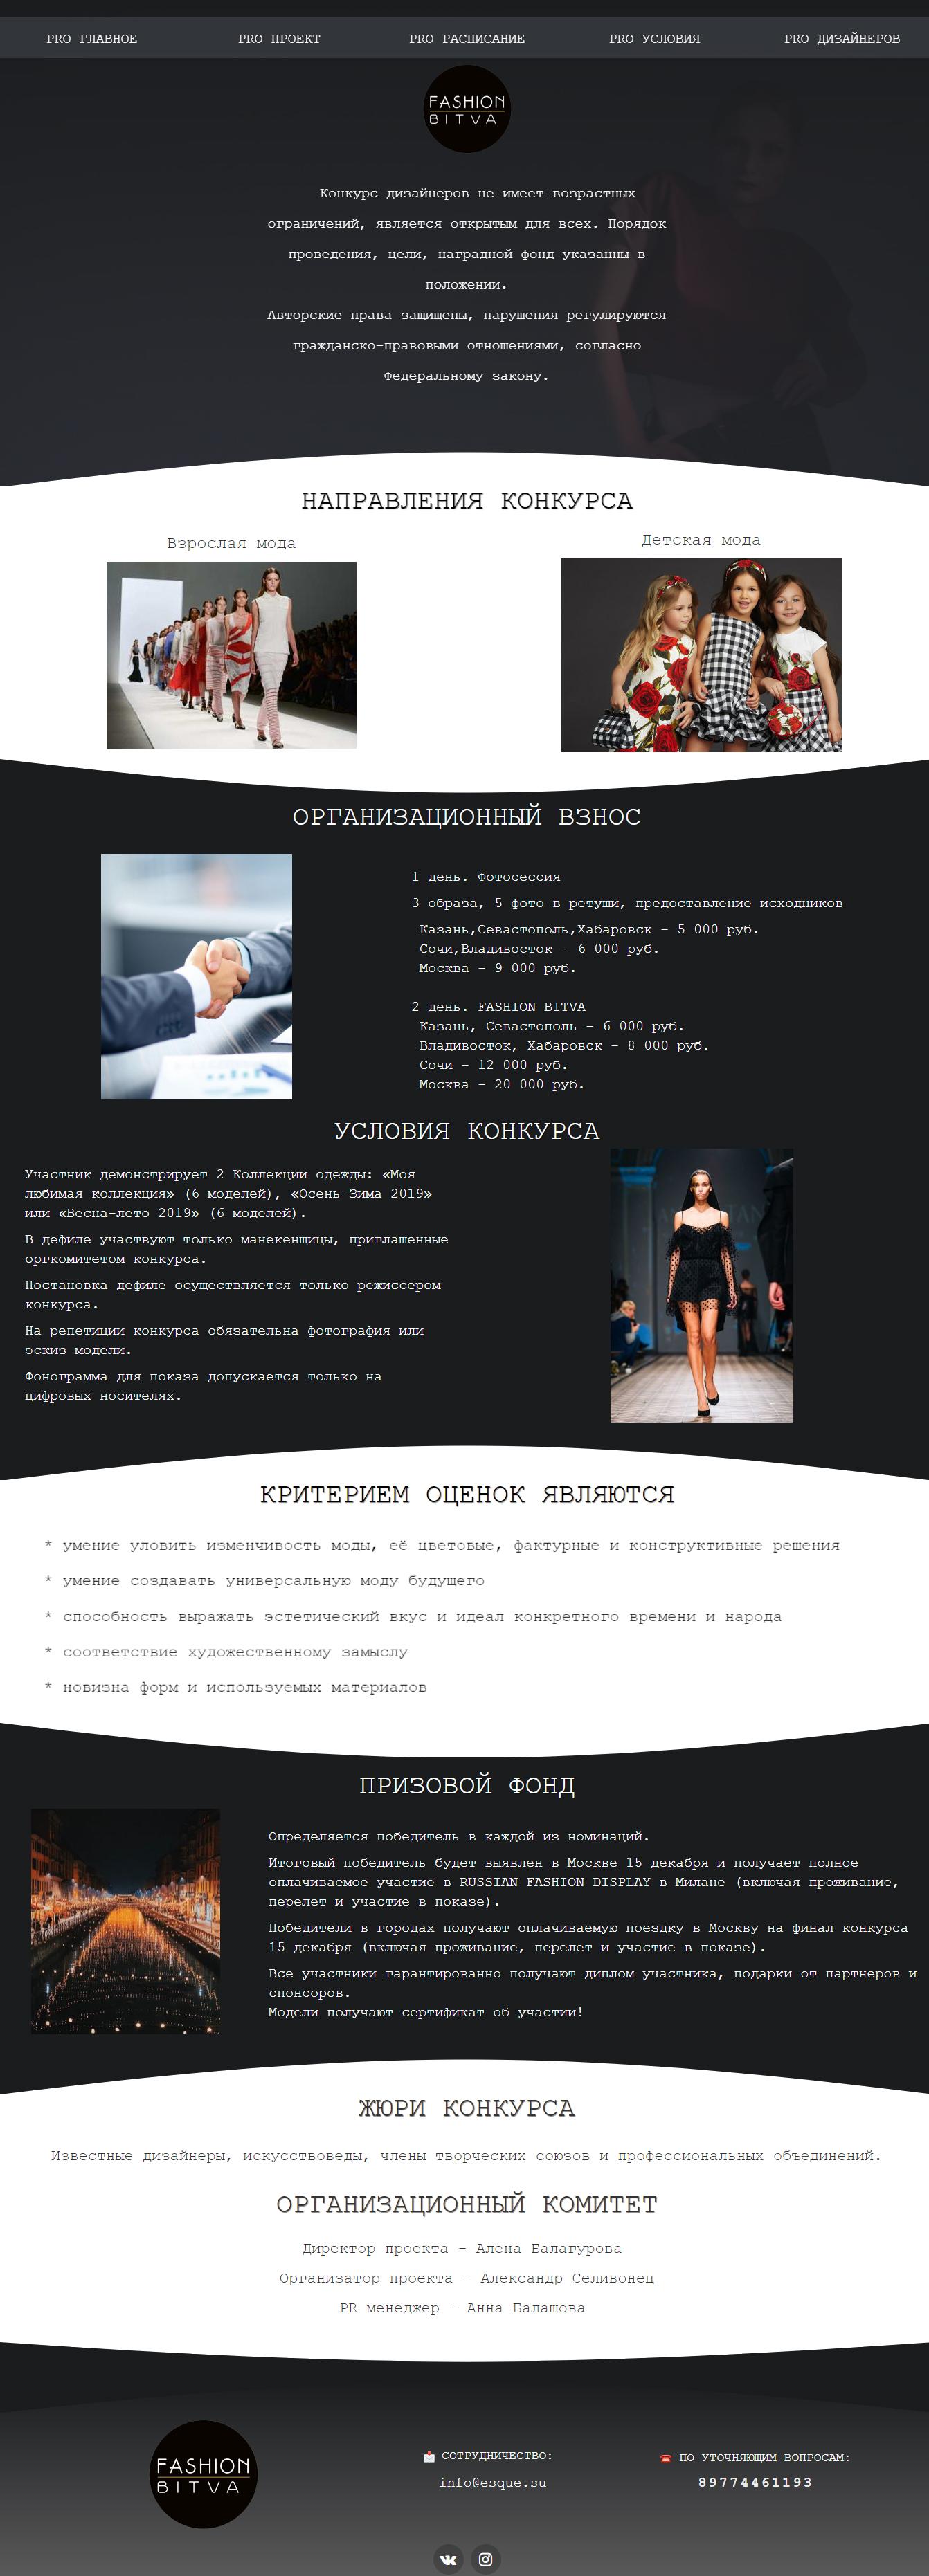 Сайт для Fashion Bitva